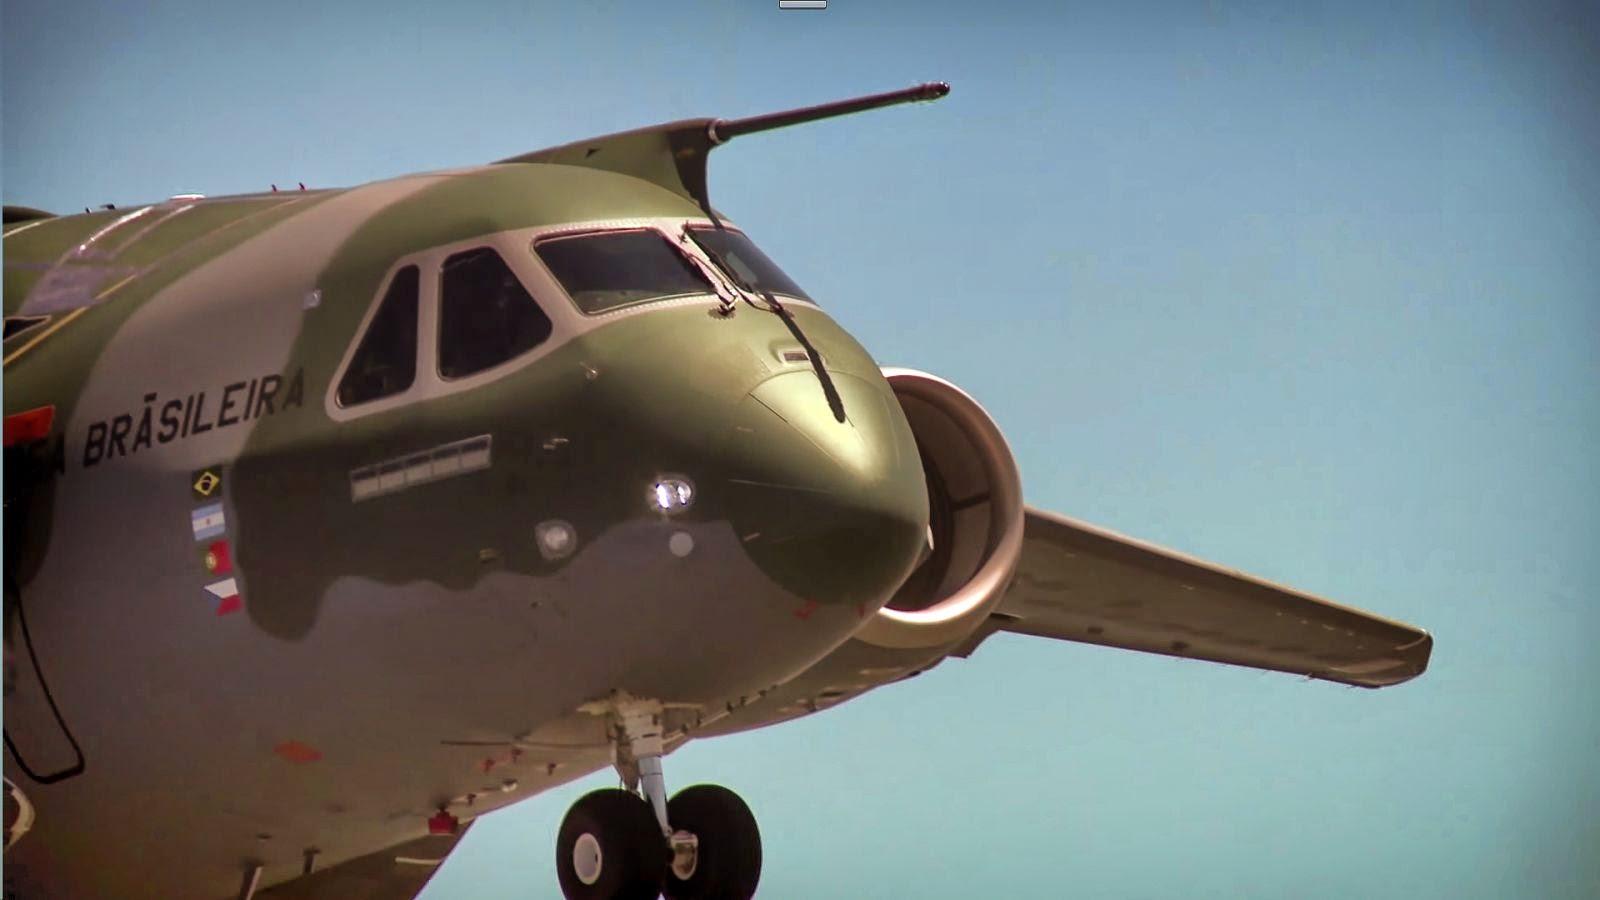 http://www.infodefensa.com/latam/2015/02/09/noticia-embraer-negocia-exportacion-aviones-kc390-europa-resto-america.html